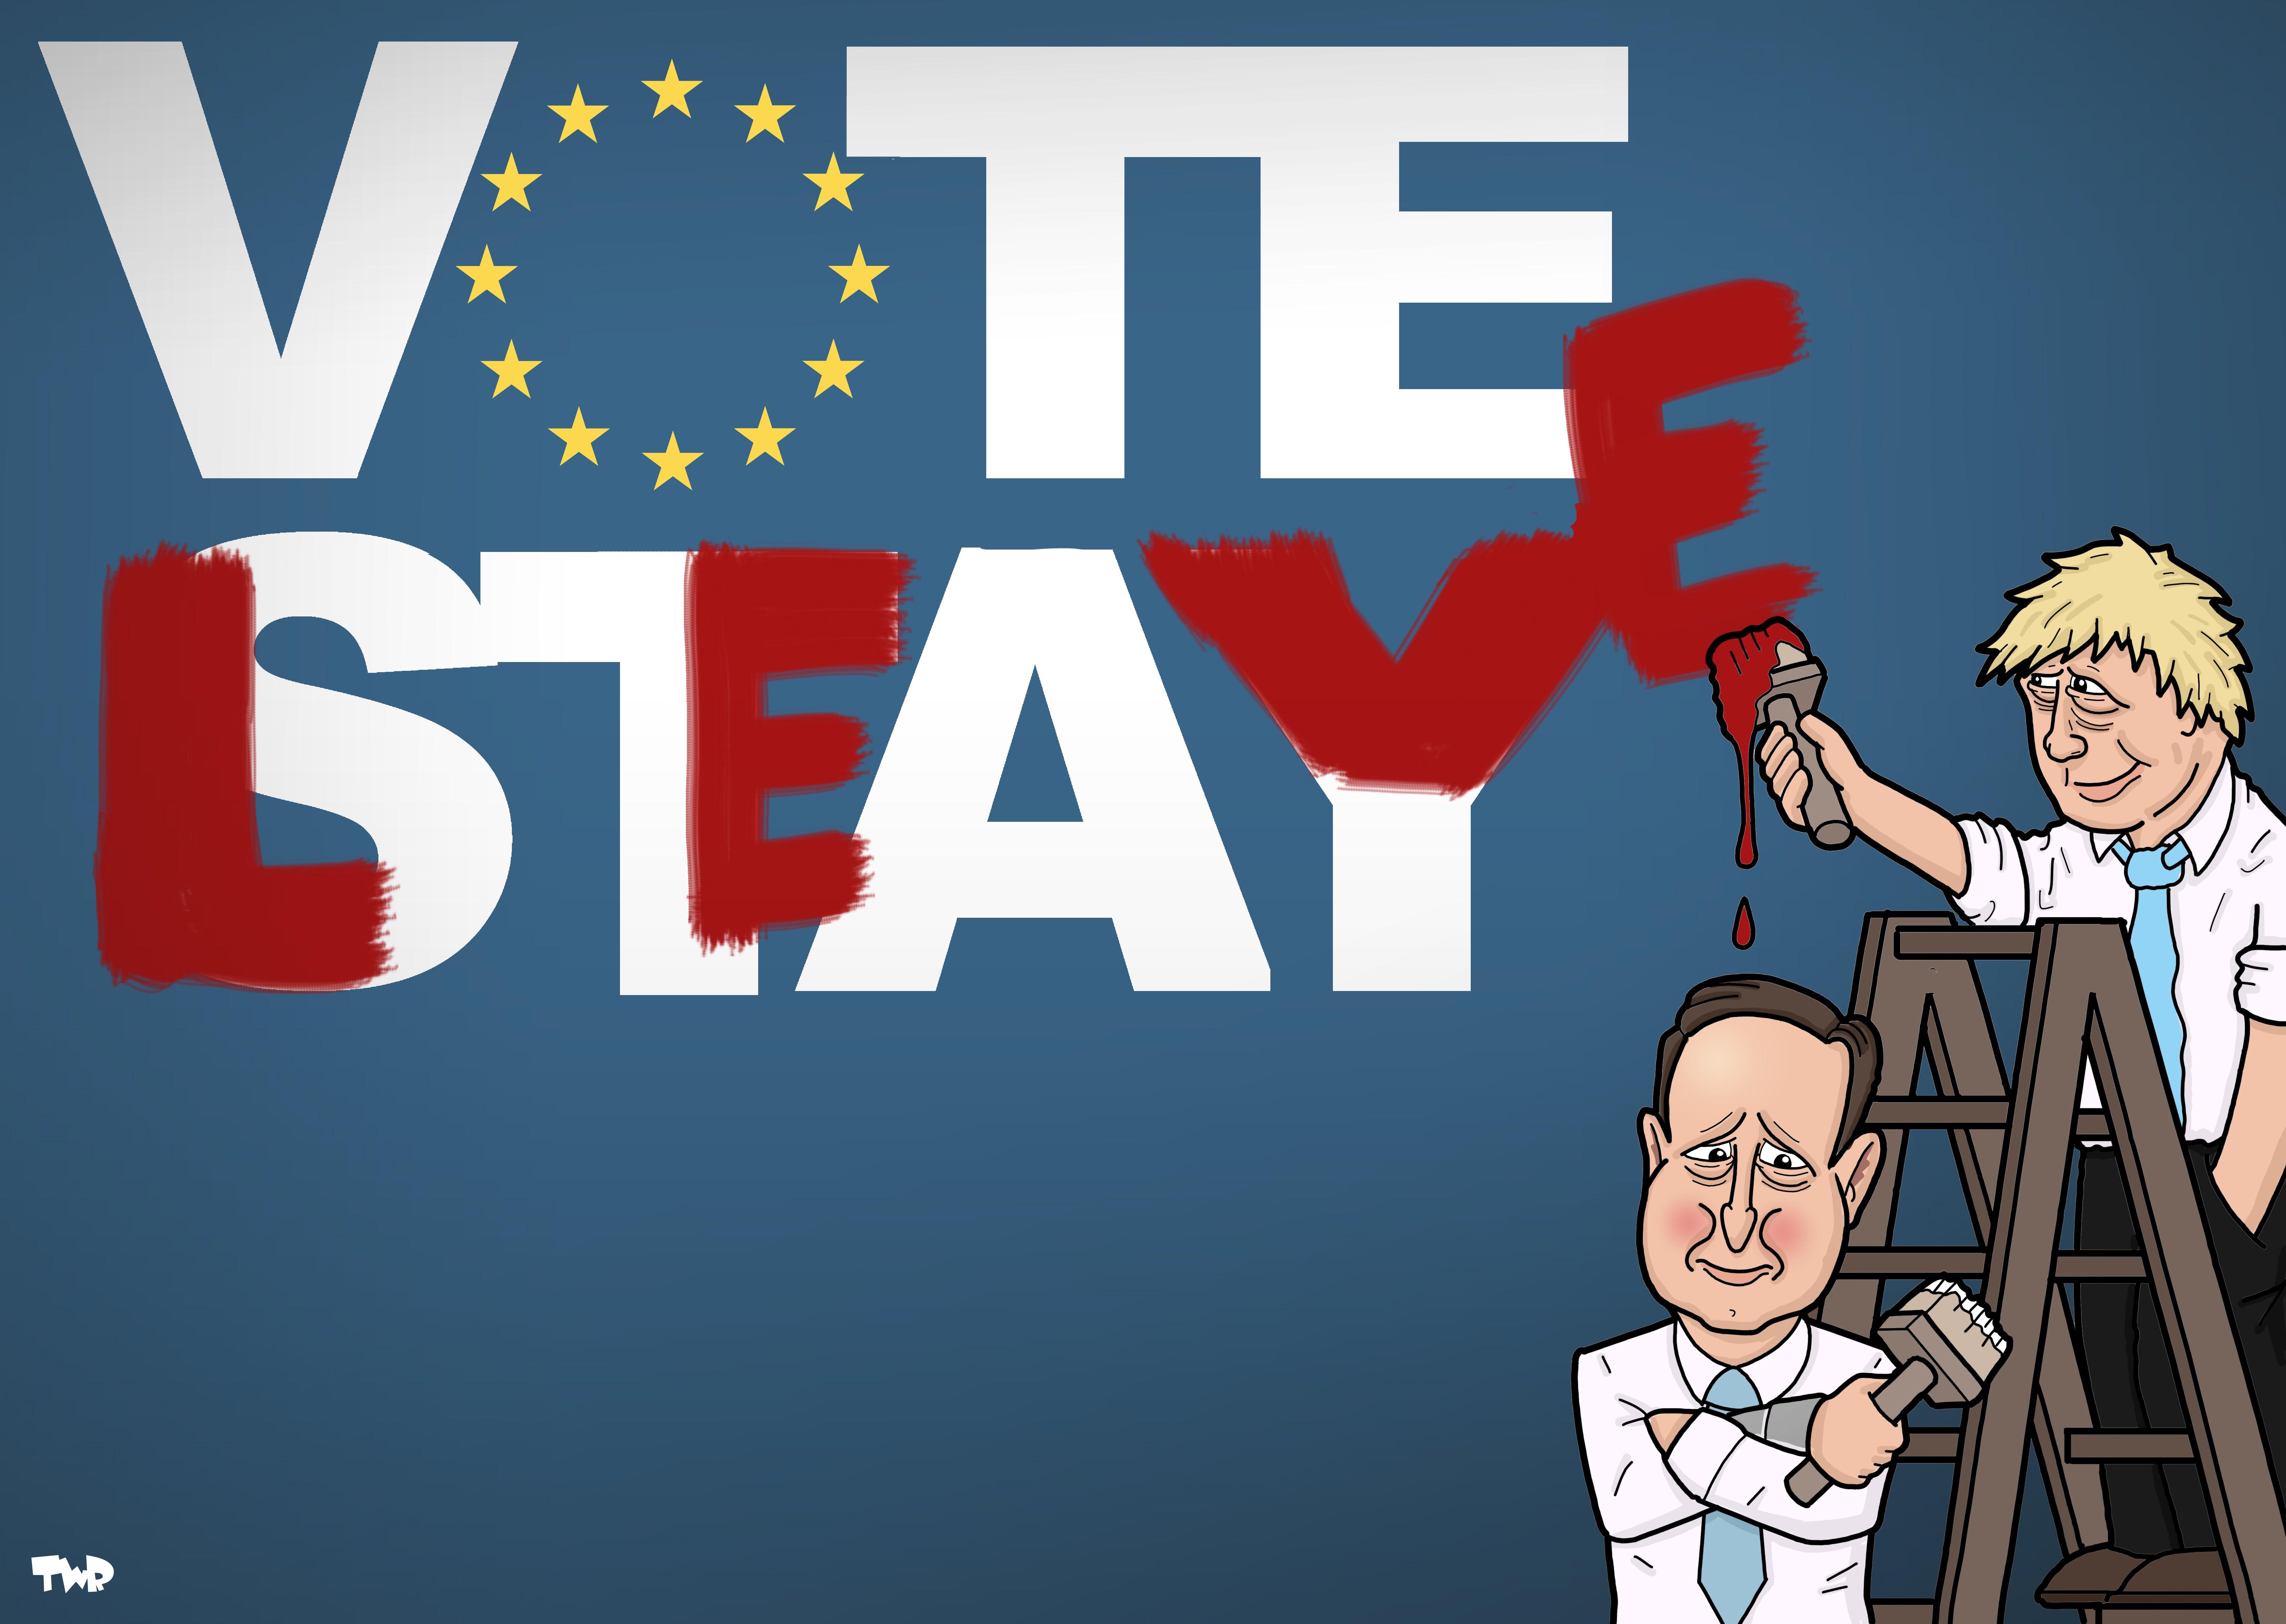 David Cameron e Boris Johnson nel cartoon di Tjeerd Royaards